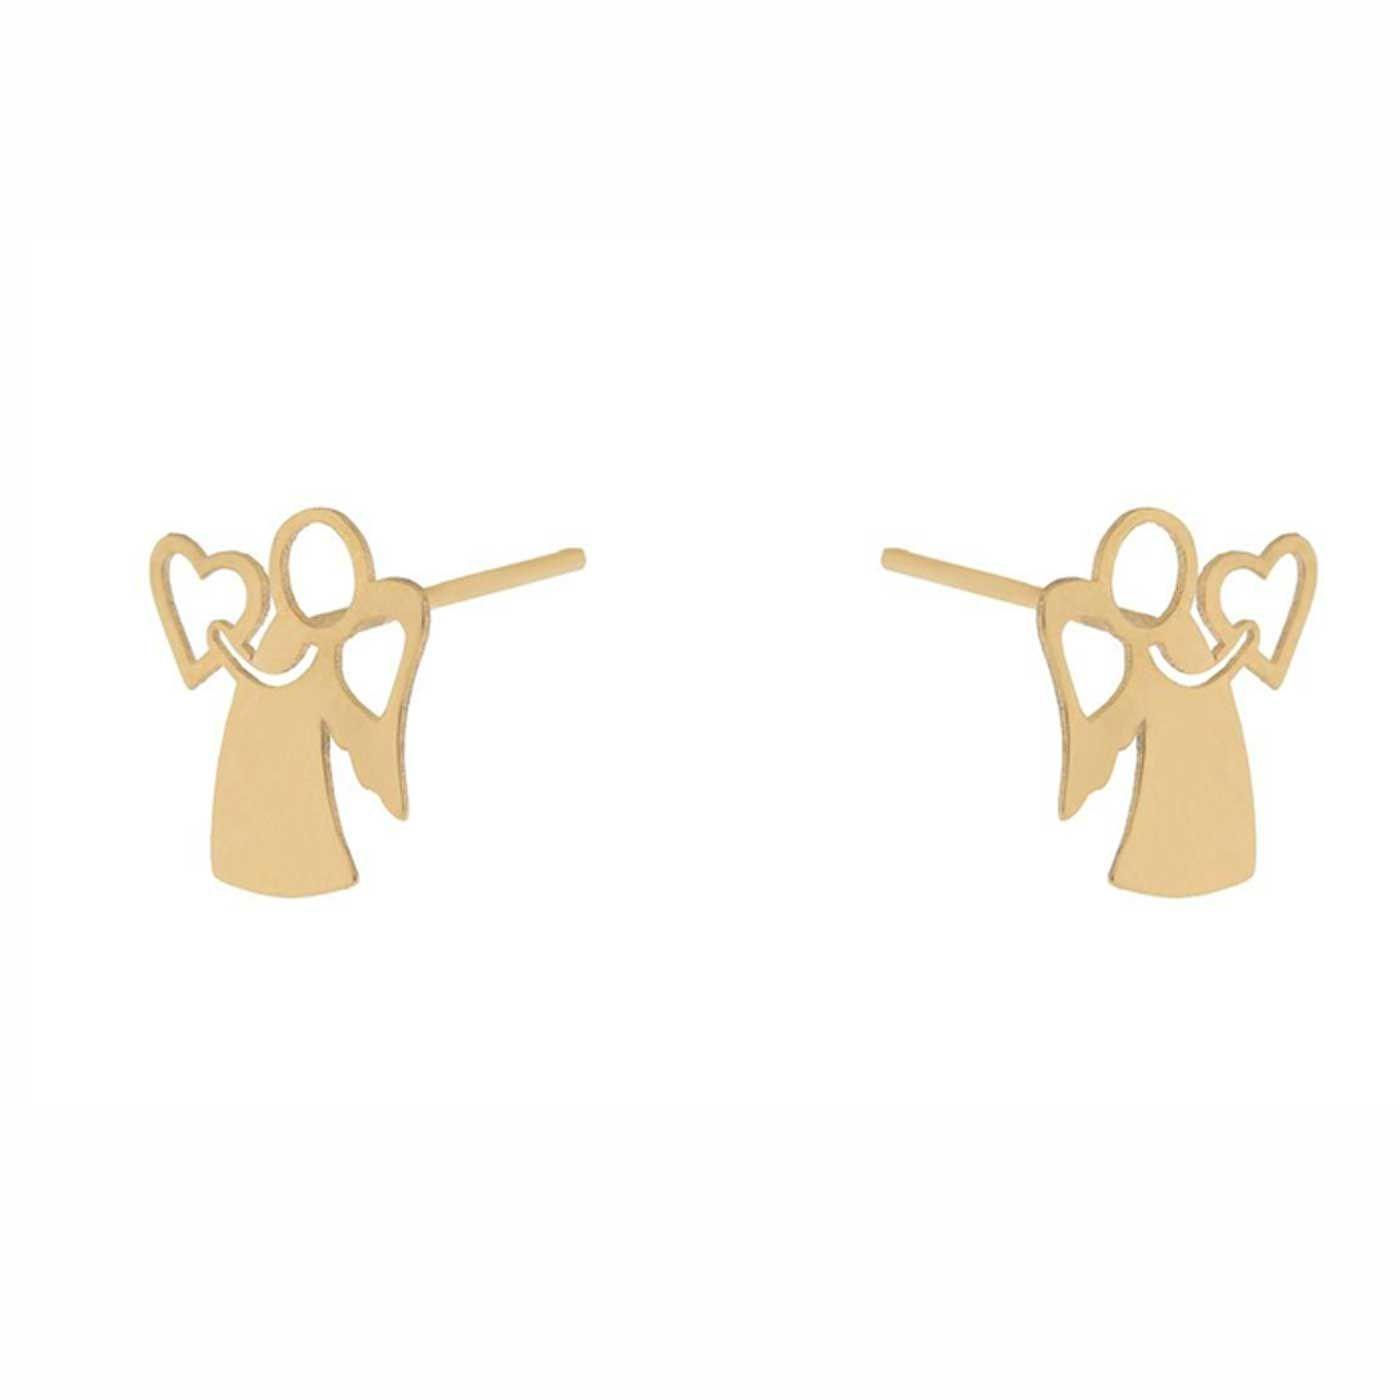 گوشواره طلا 18 عیار زنانه کانیار گالری کد GOA105 -  - 4